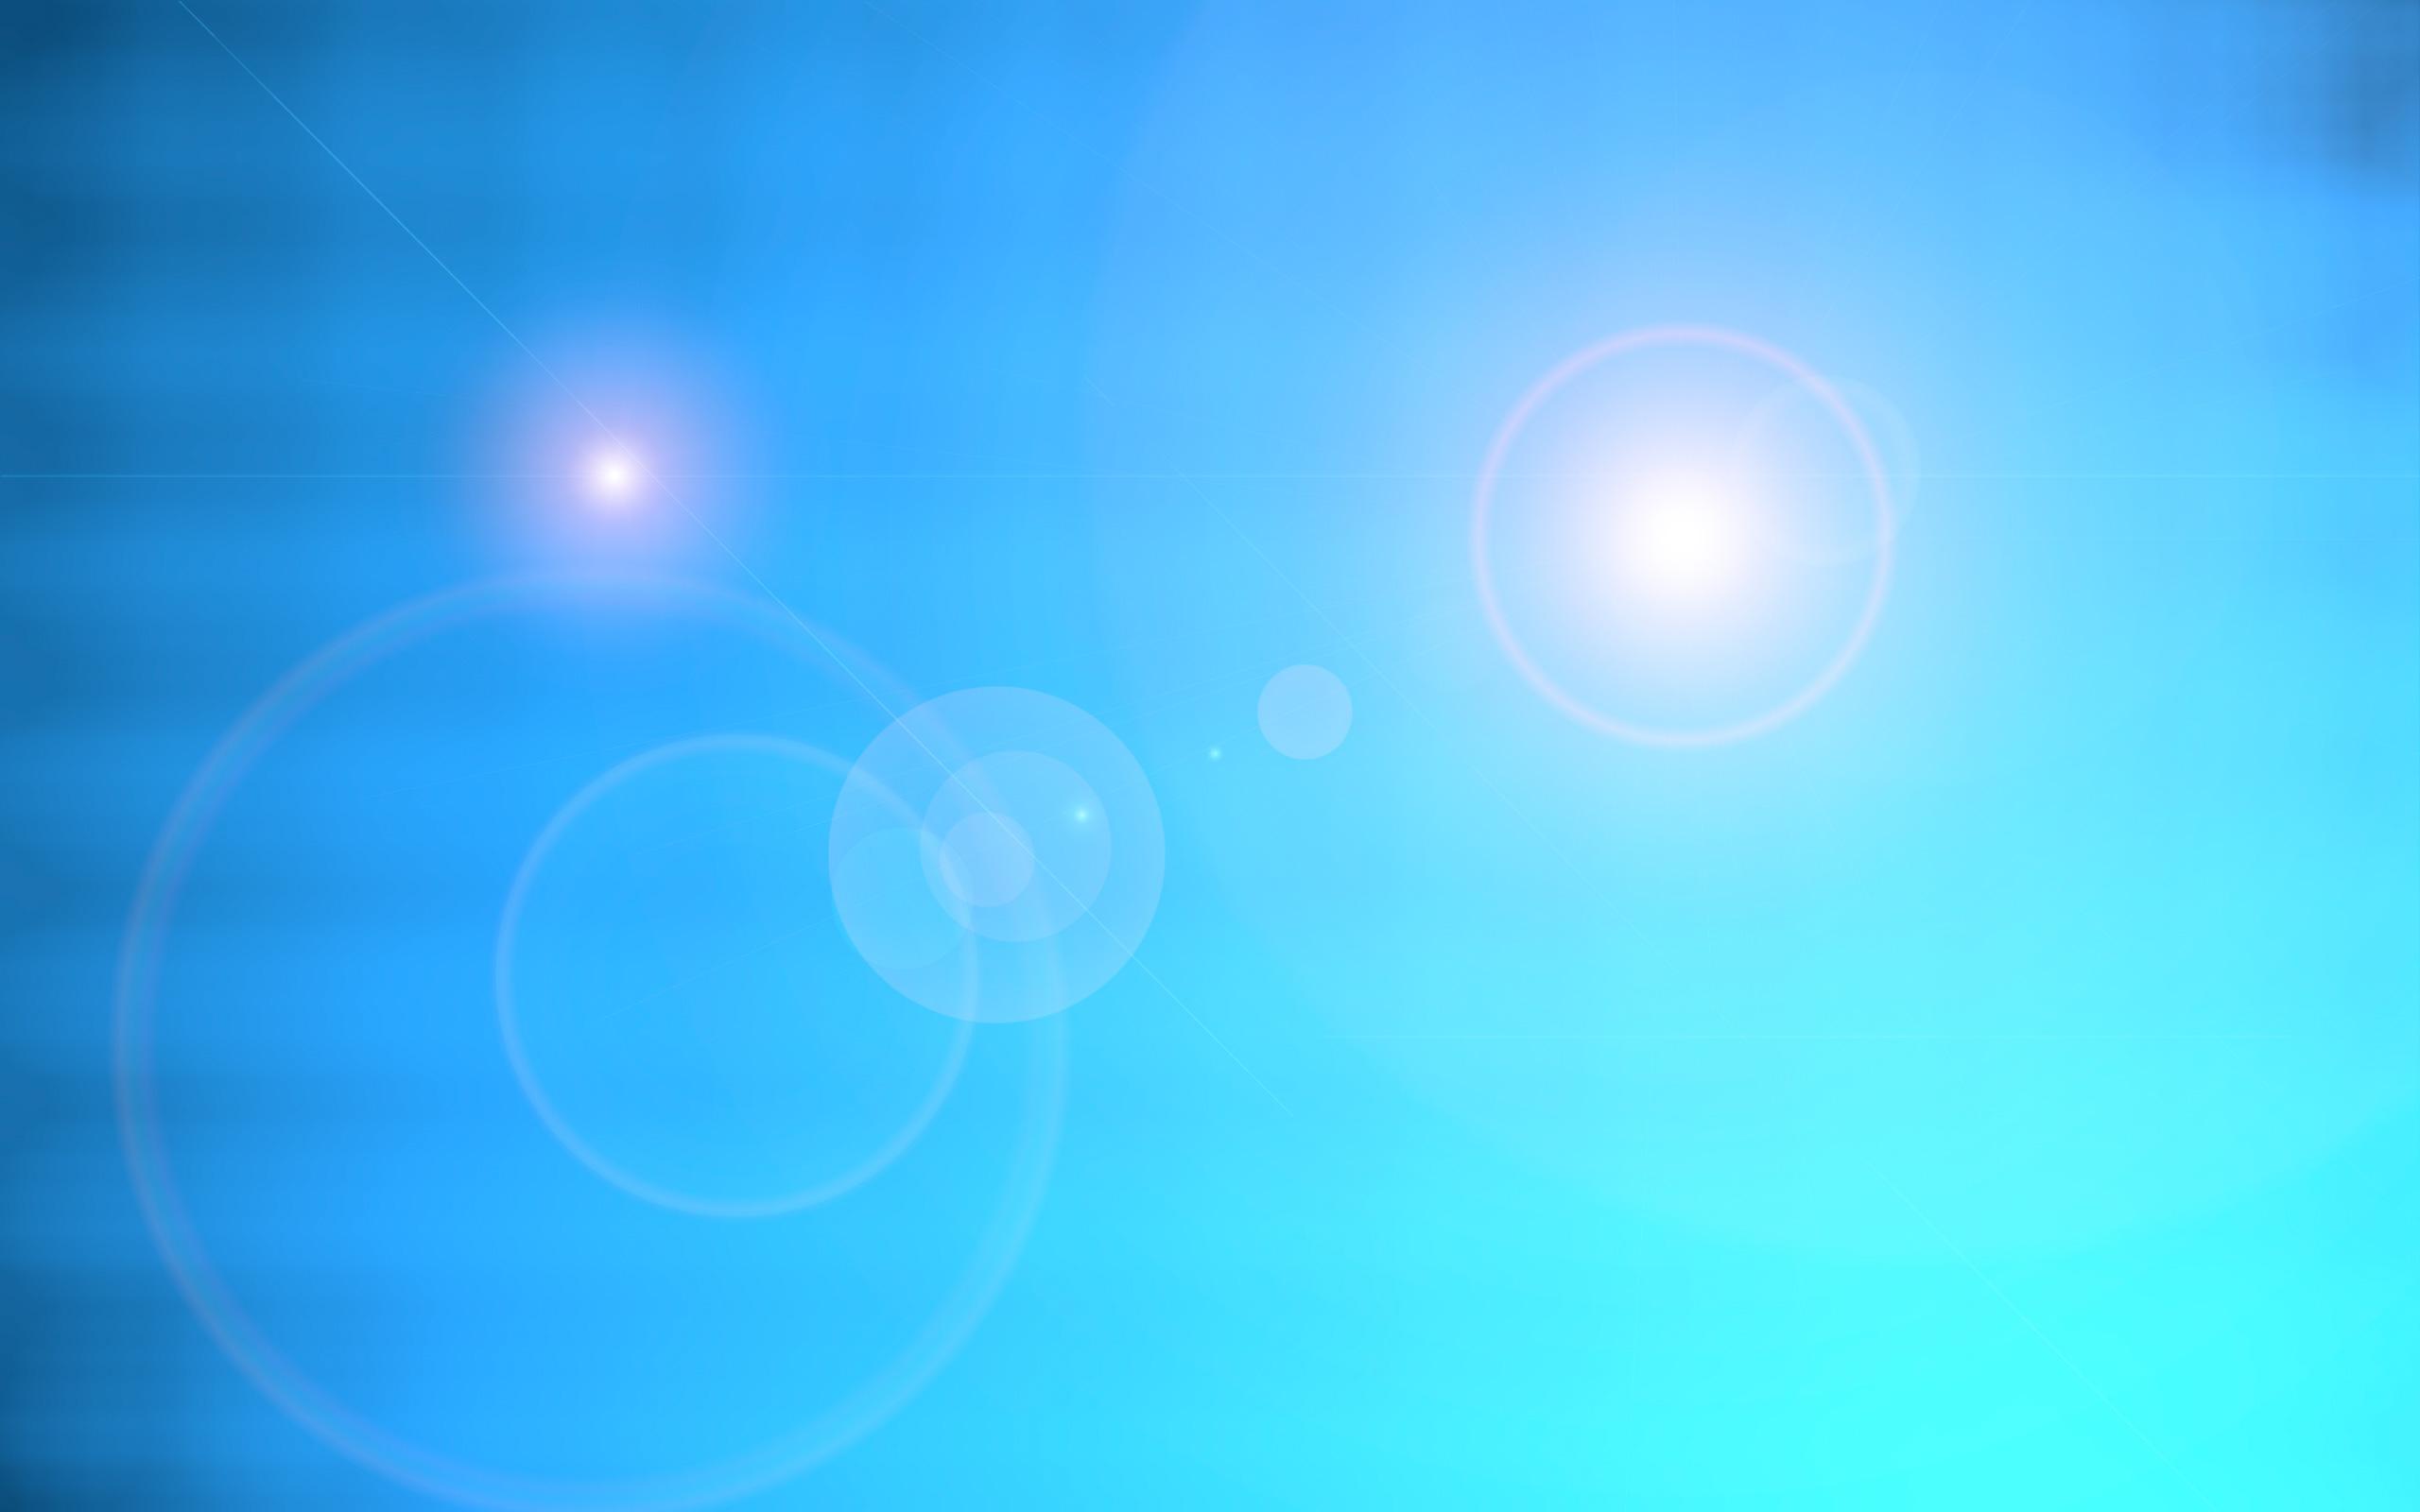 blue desktop background for Mac OS and Windows Vista High 2560x1600